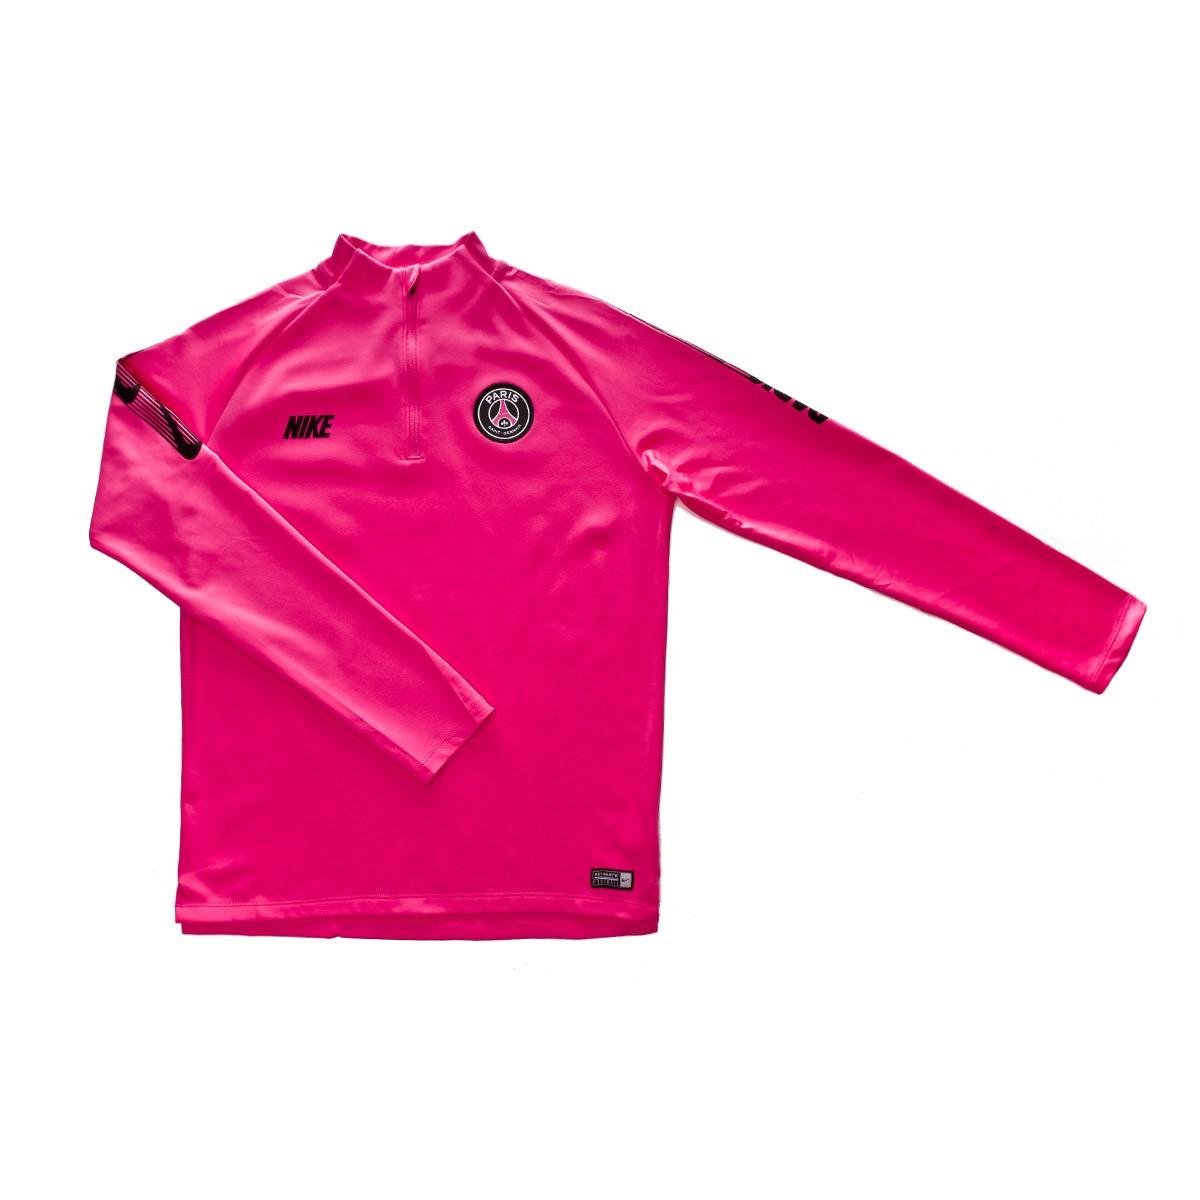 7db735589f0ff6 Sweatshirt Nike Paris Saint-Germain Squad 2018-2019 NIño Hyper pink ...